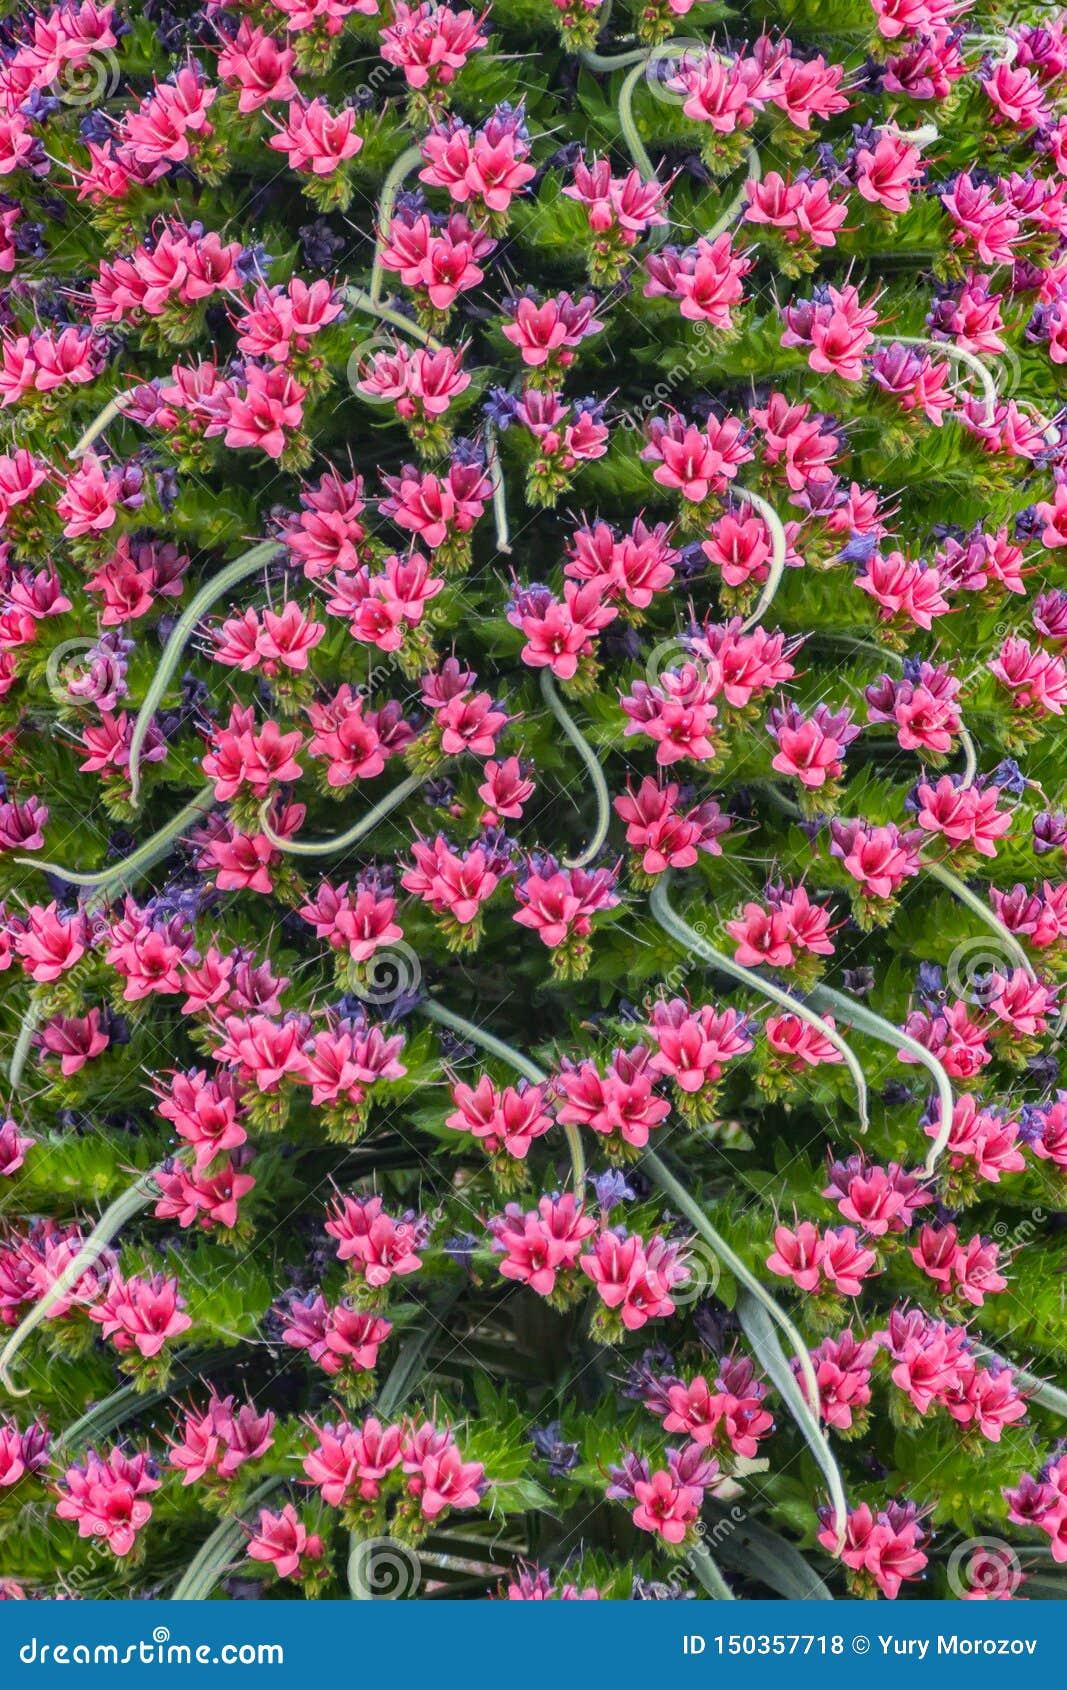 Wild Endemic beautiful flower Tajinaste rojo Echium wildpretii. Travel card. Clean background. Teide National Park, Tenerife,